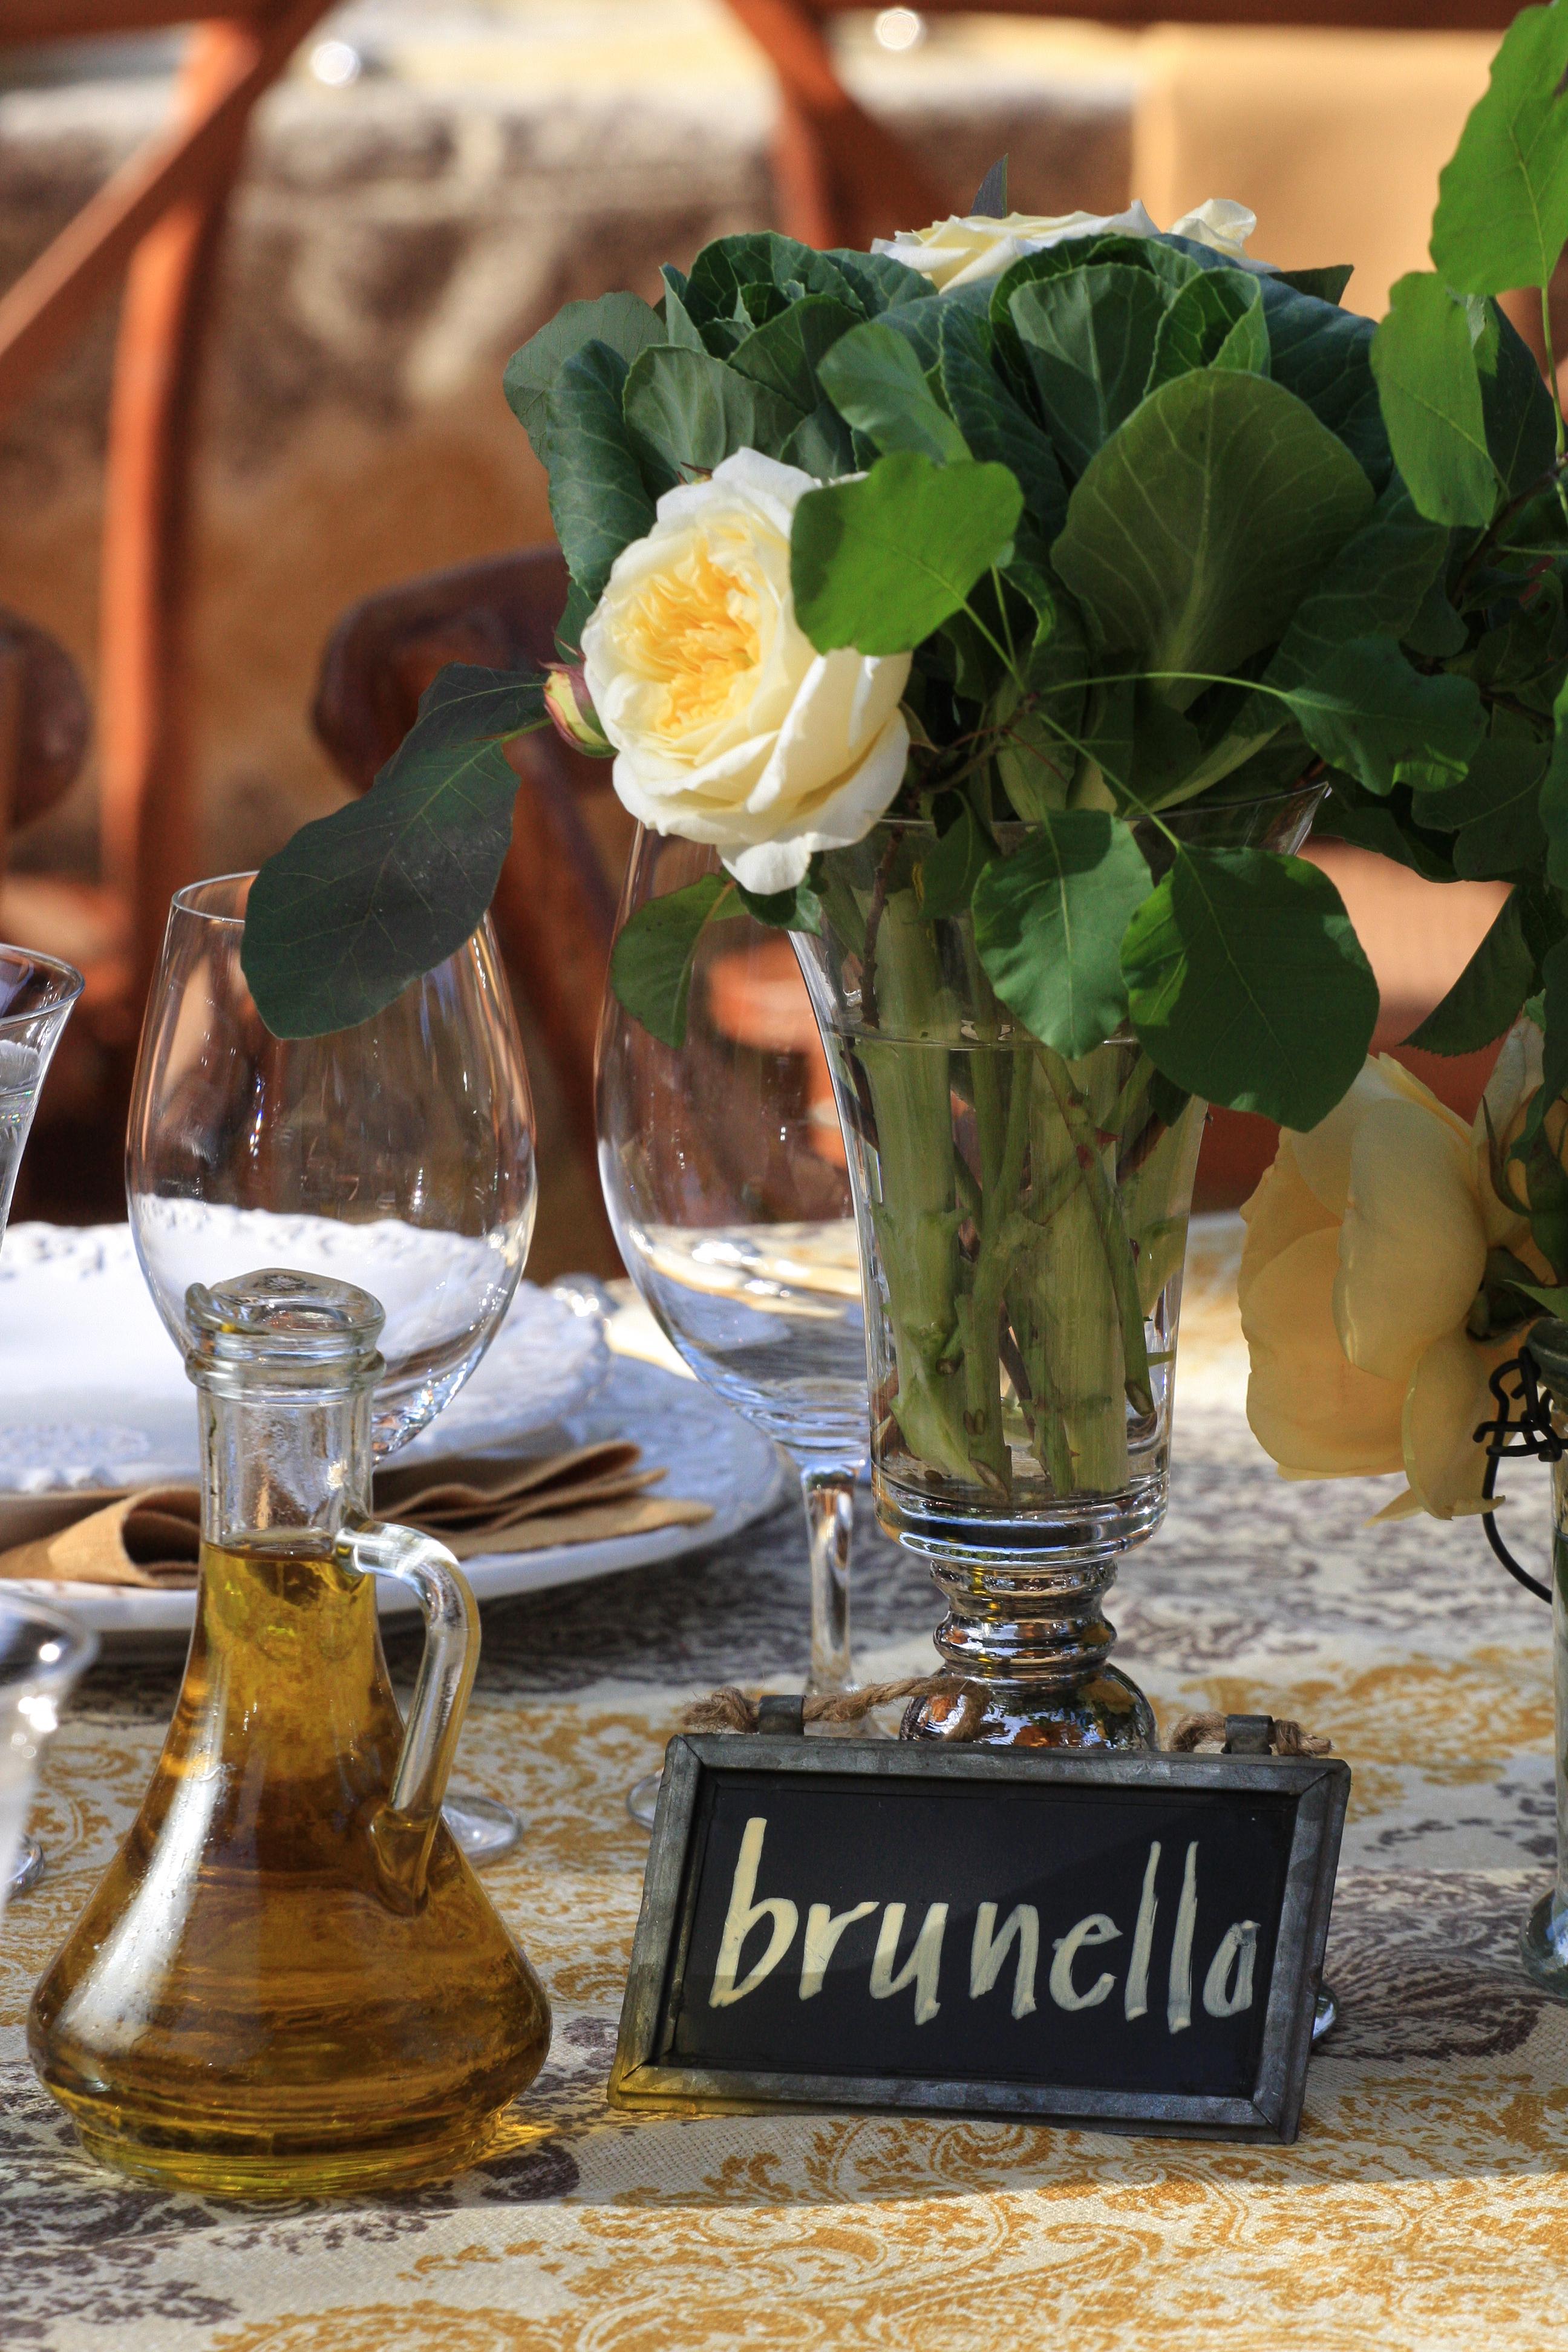 Wine varietal table name & flowers